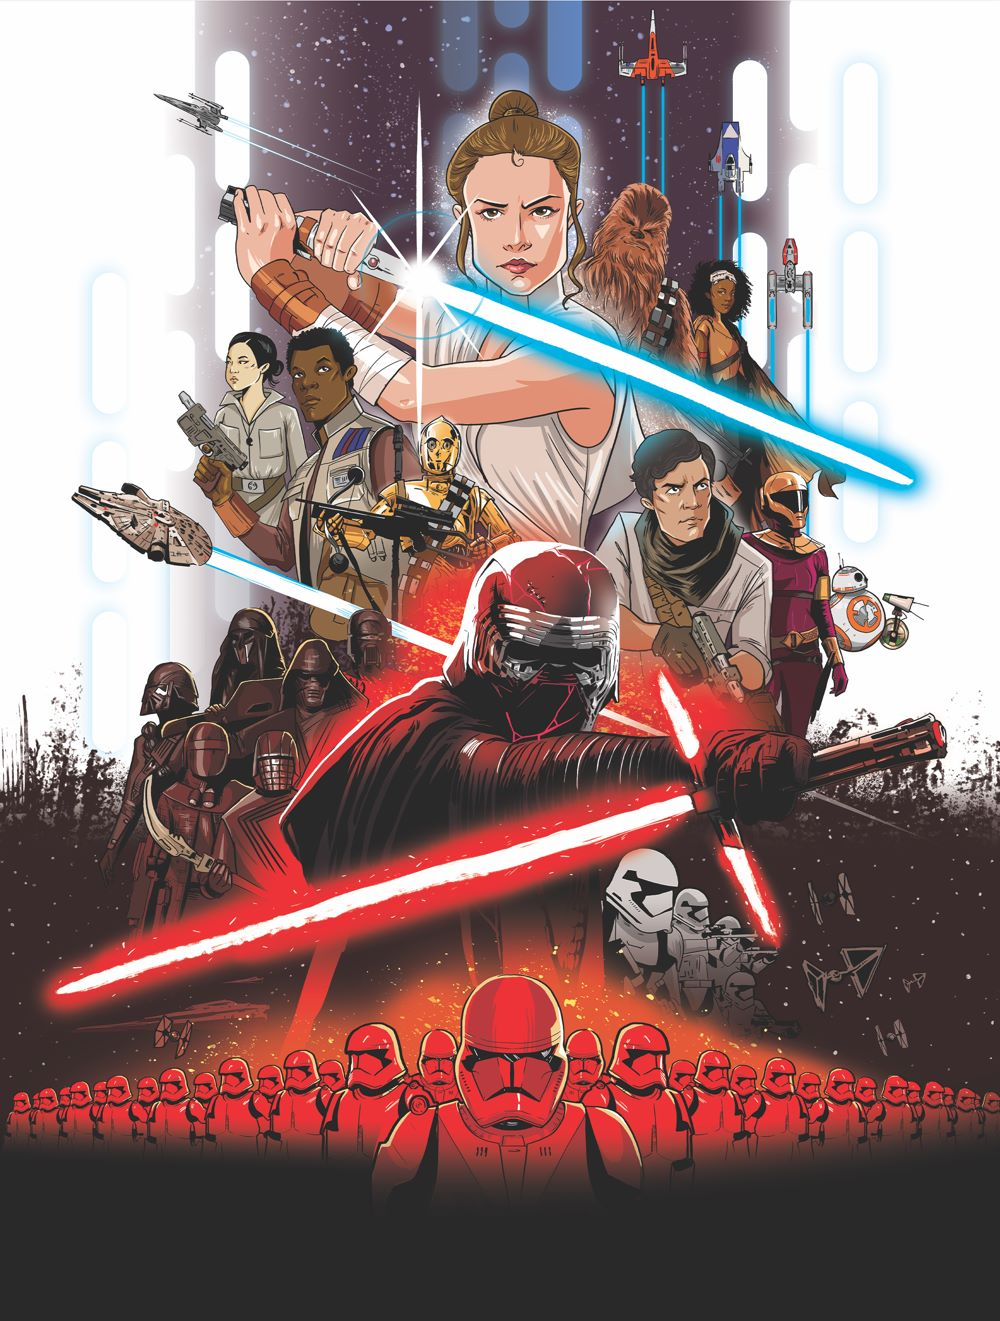 SW_RiseOfSkywalker_Cover_V3 ComicList Previews: STAR WARS THE RISE OF SKYWALKER GN